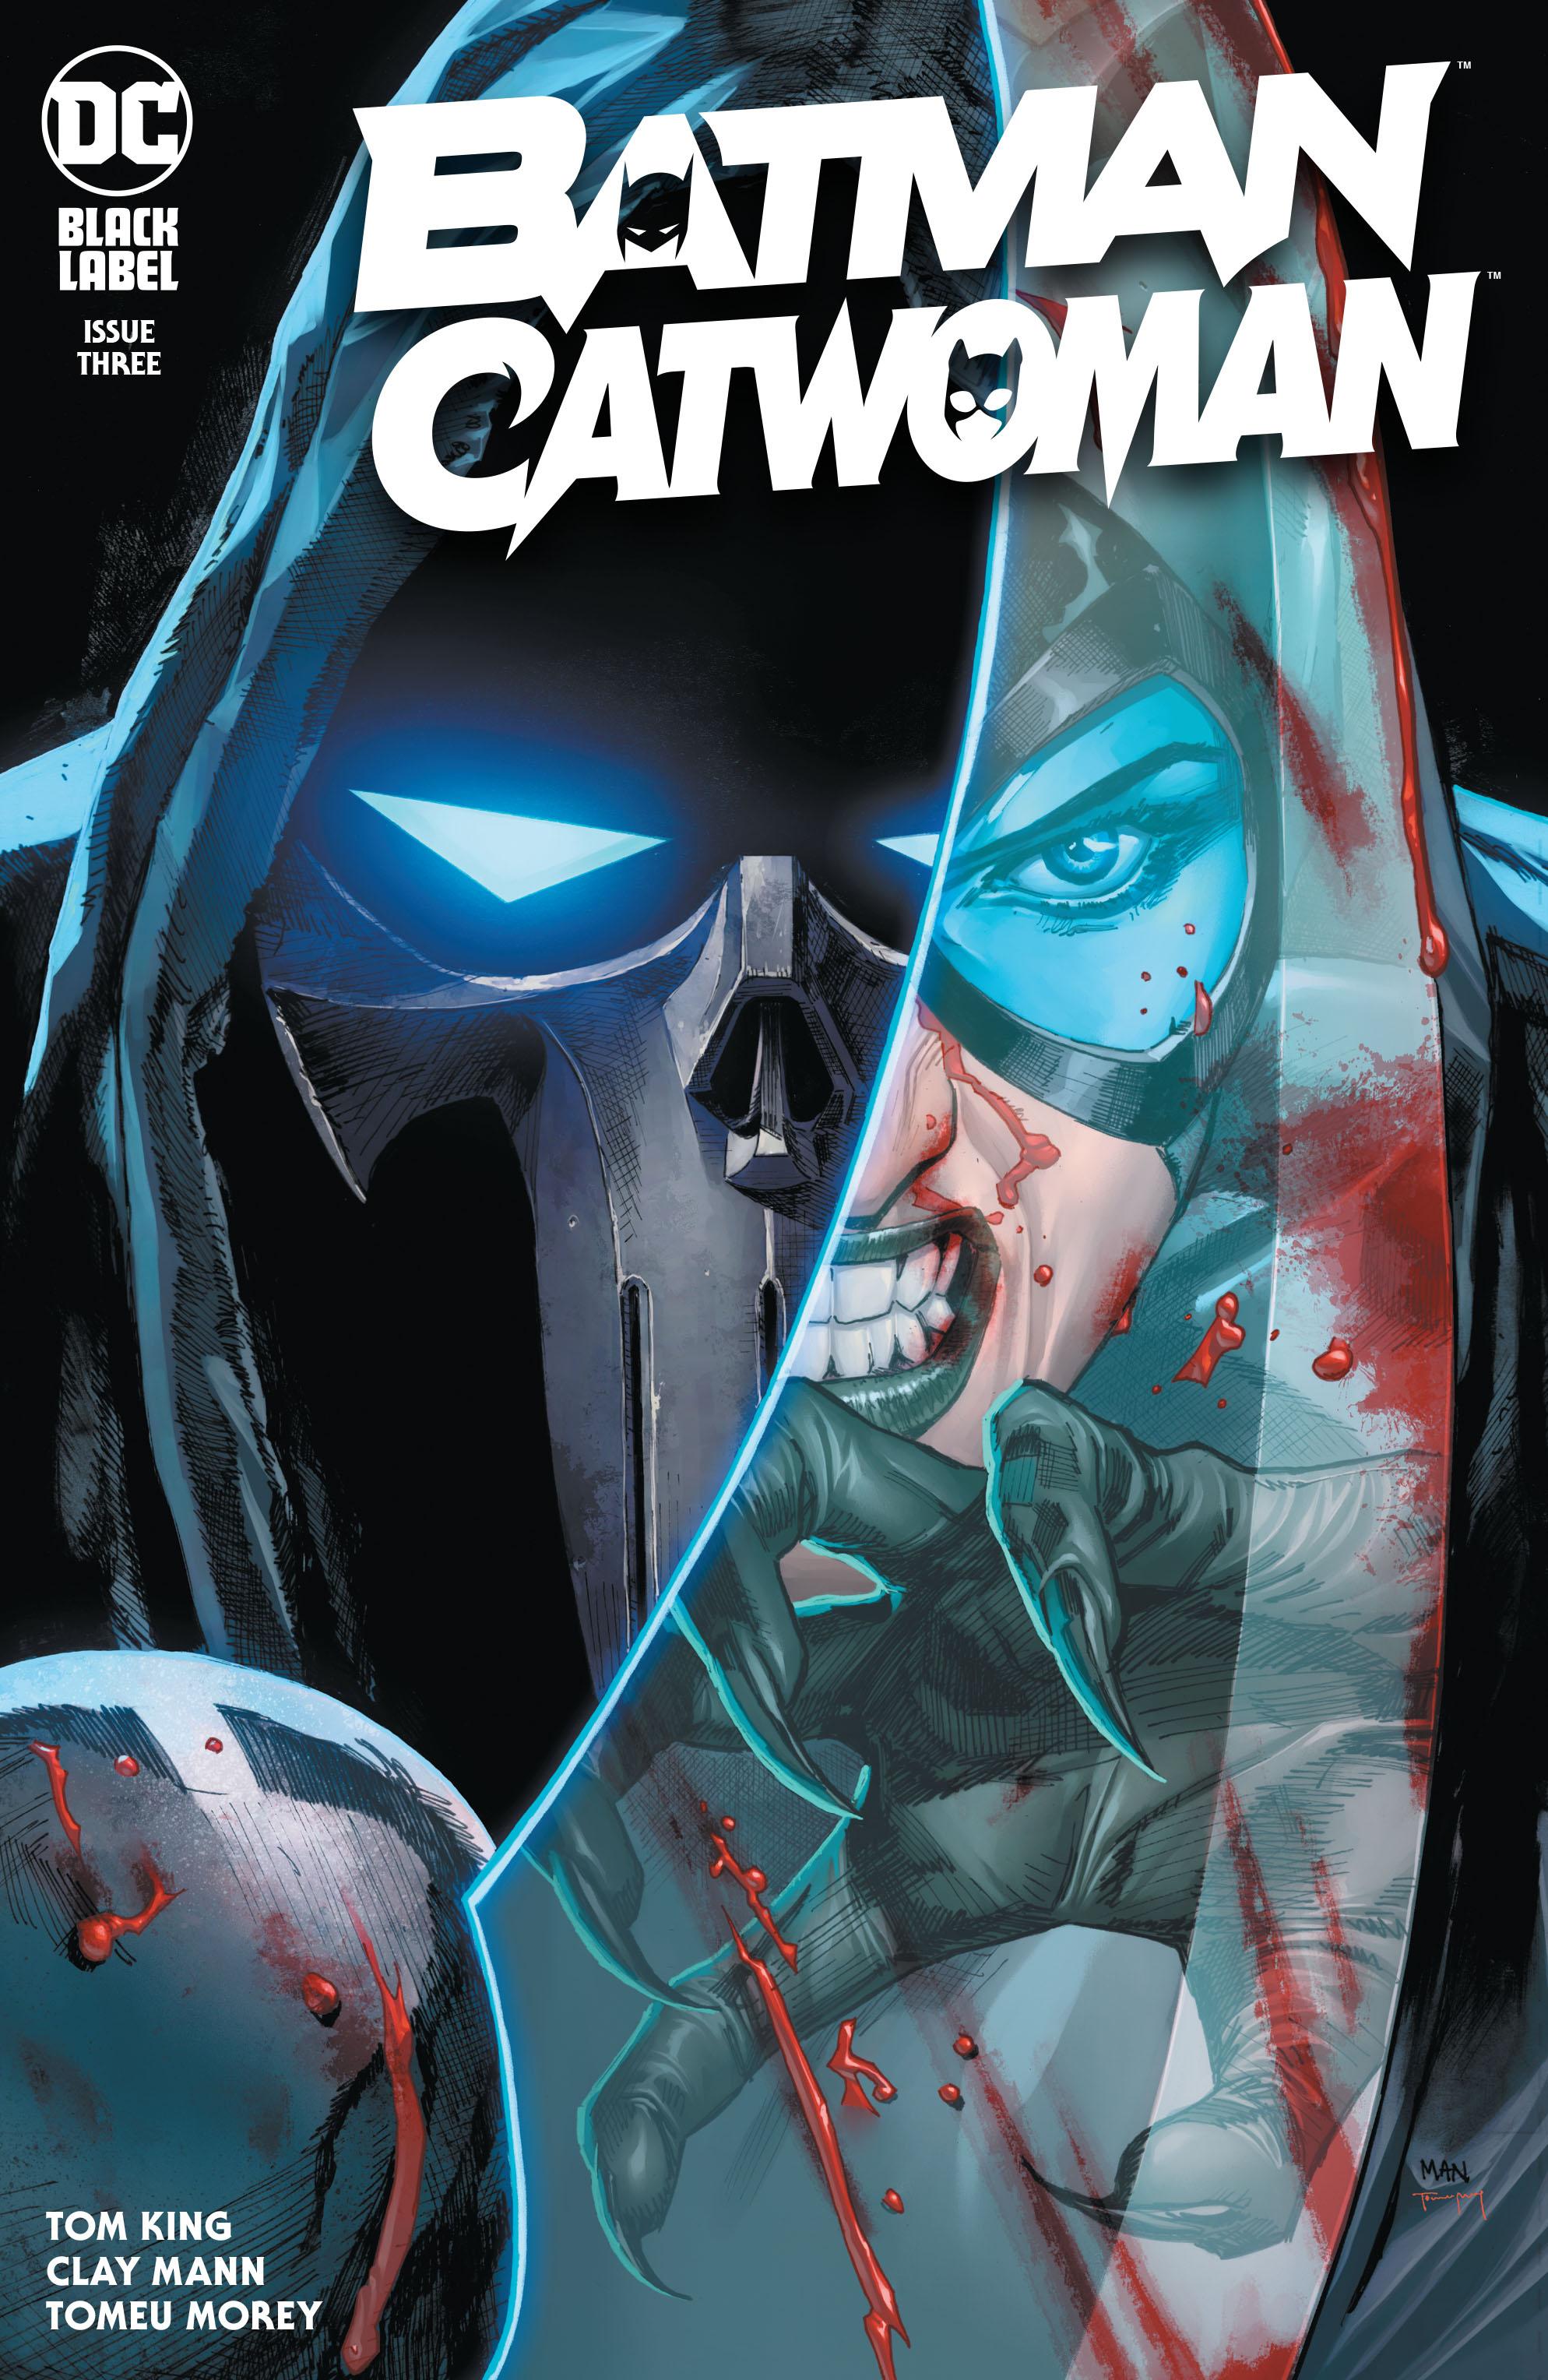 BATMAN CATWOMAN #3 (OF 12) CVR A CLAY MANN